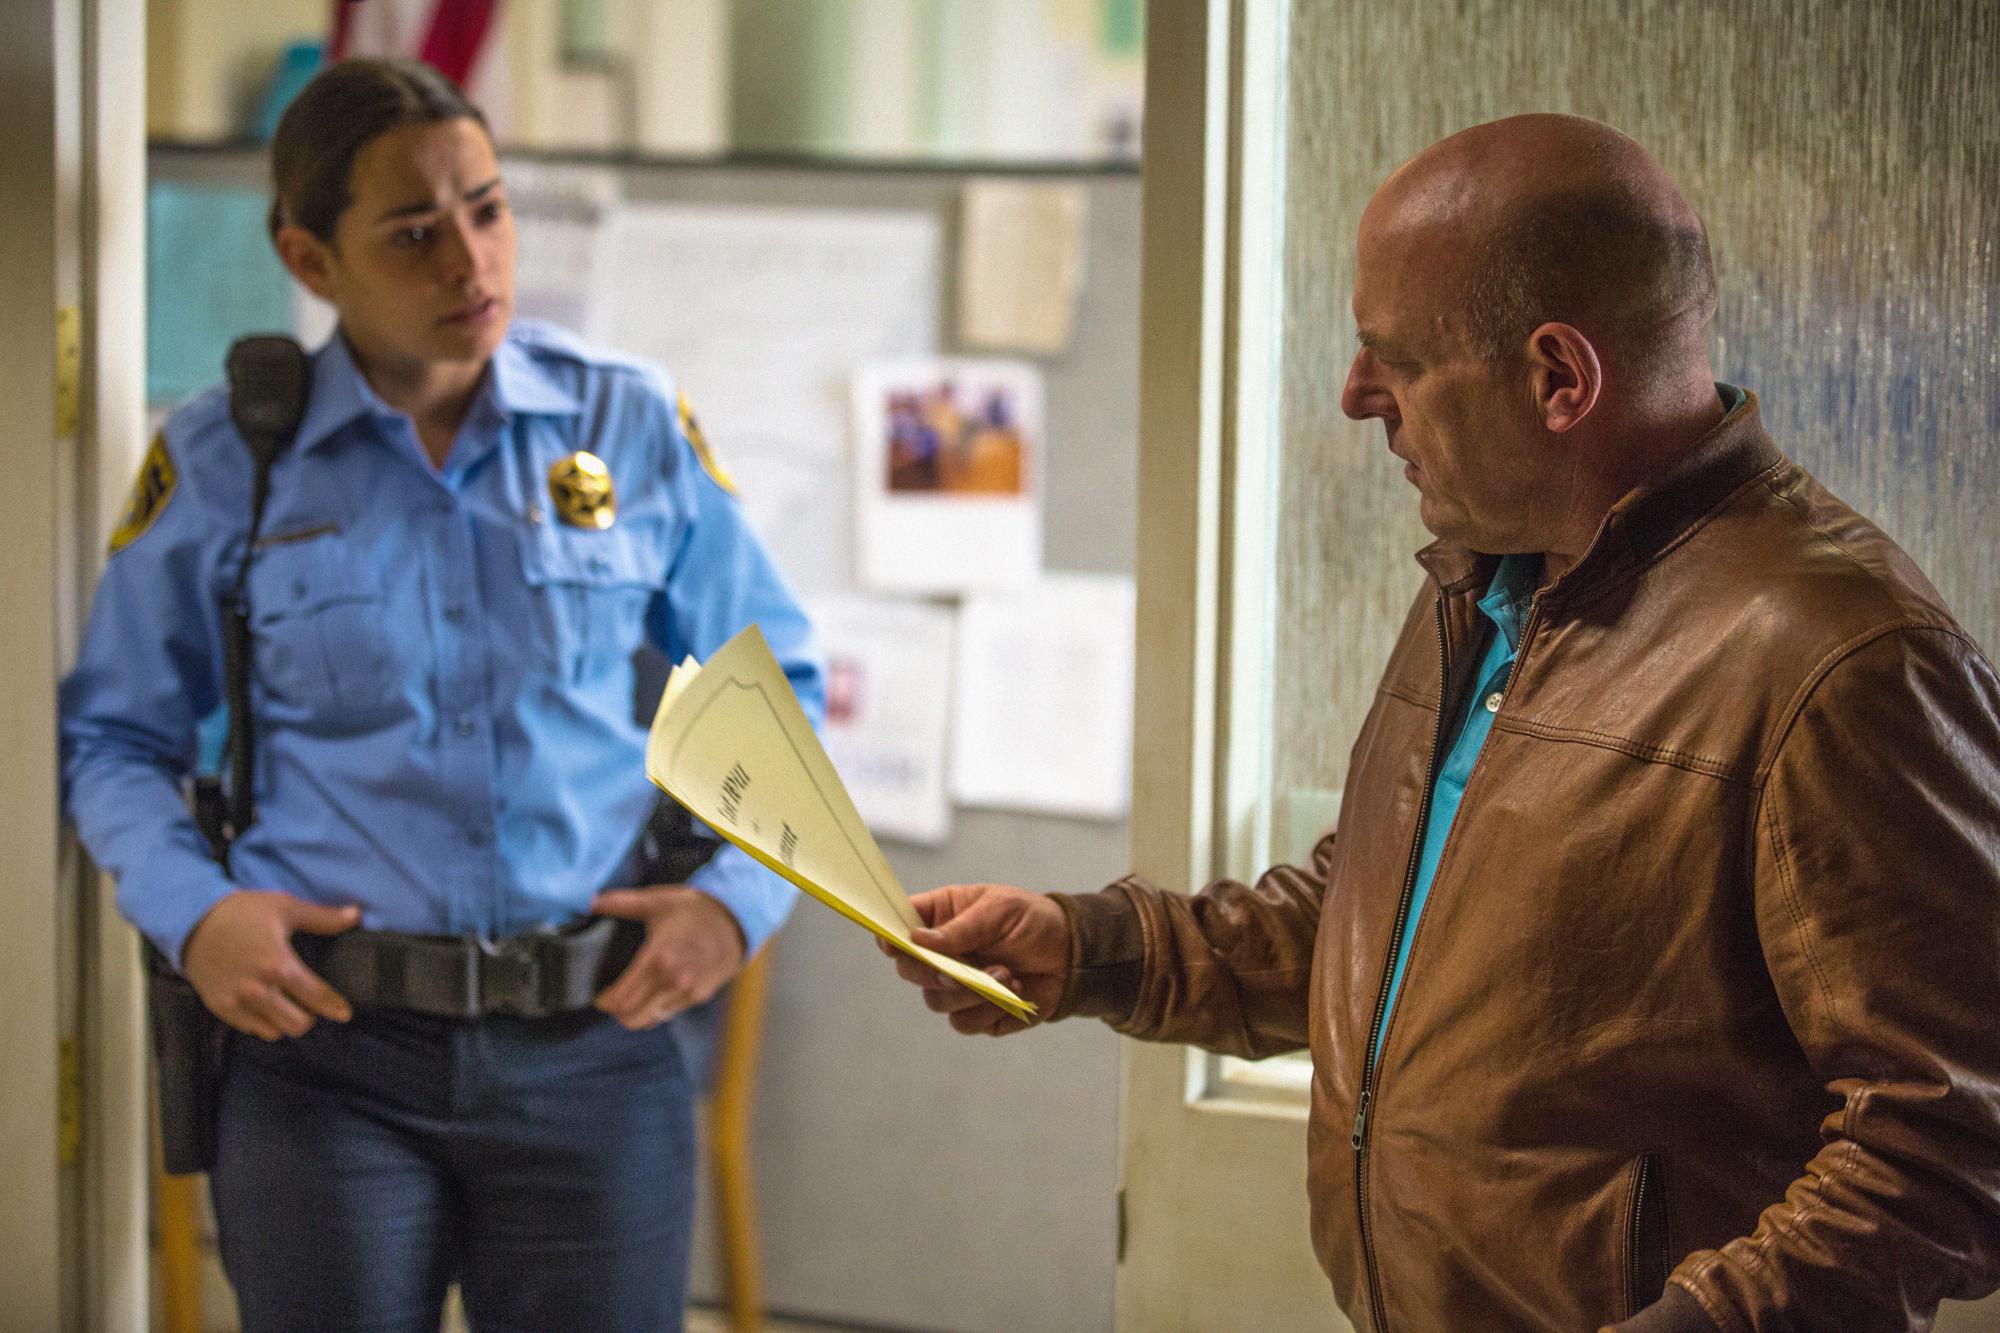 Deputy Linda and Big Jim